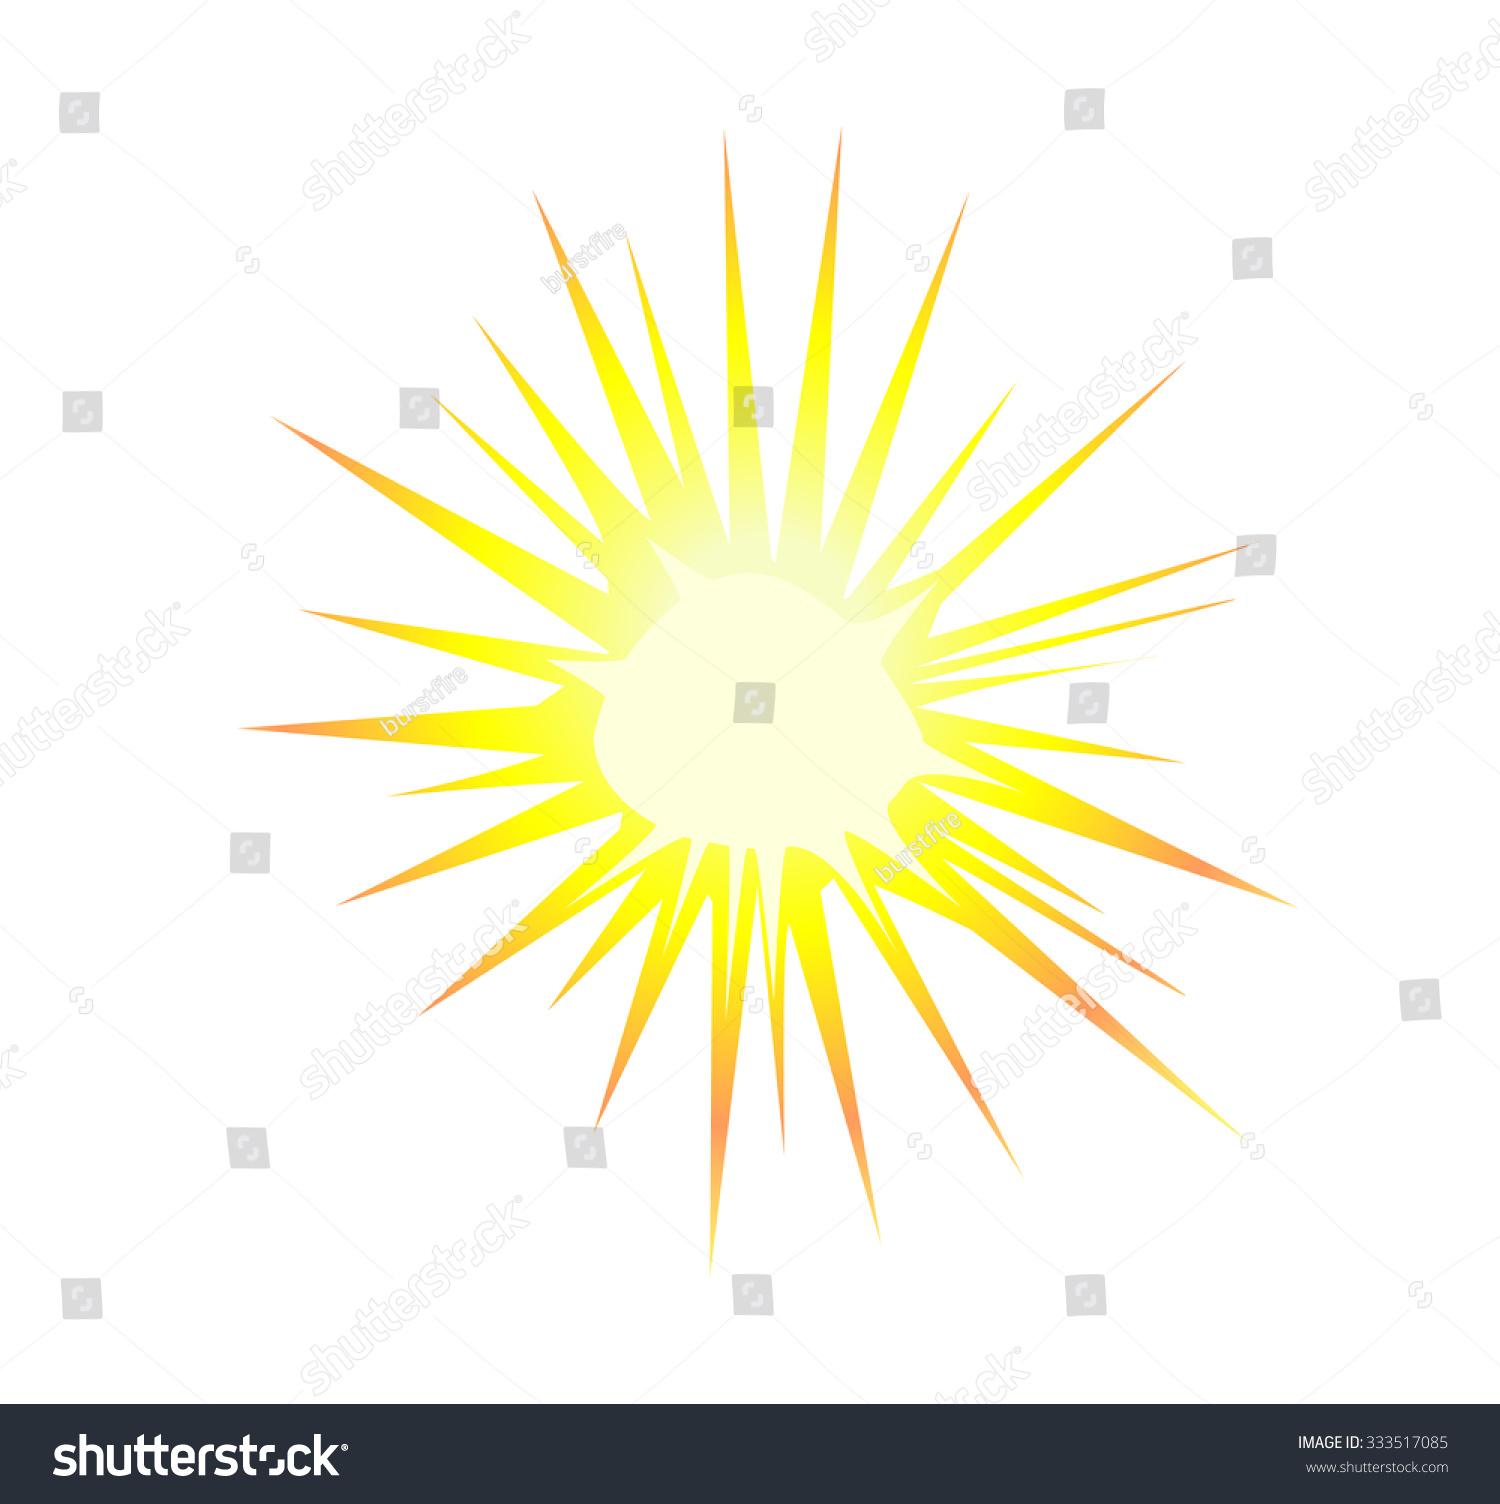 Explosion blast symbol element illustration stock illustration explosion blast symbol element illustration buycottarizona